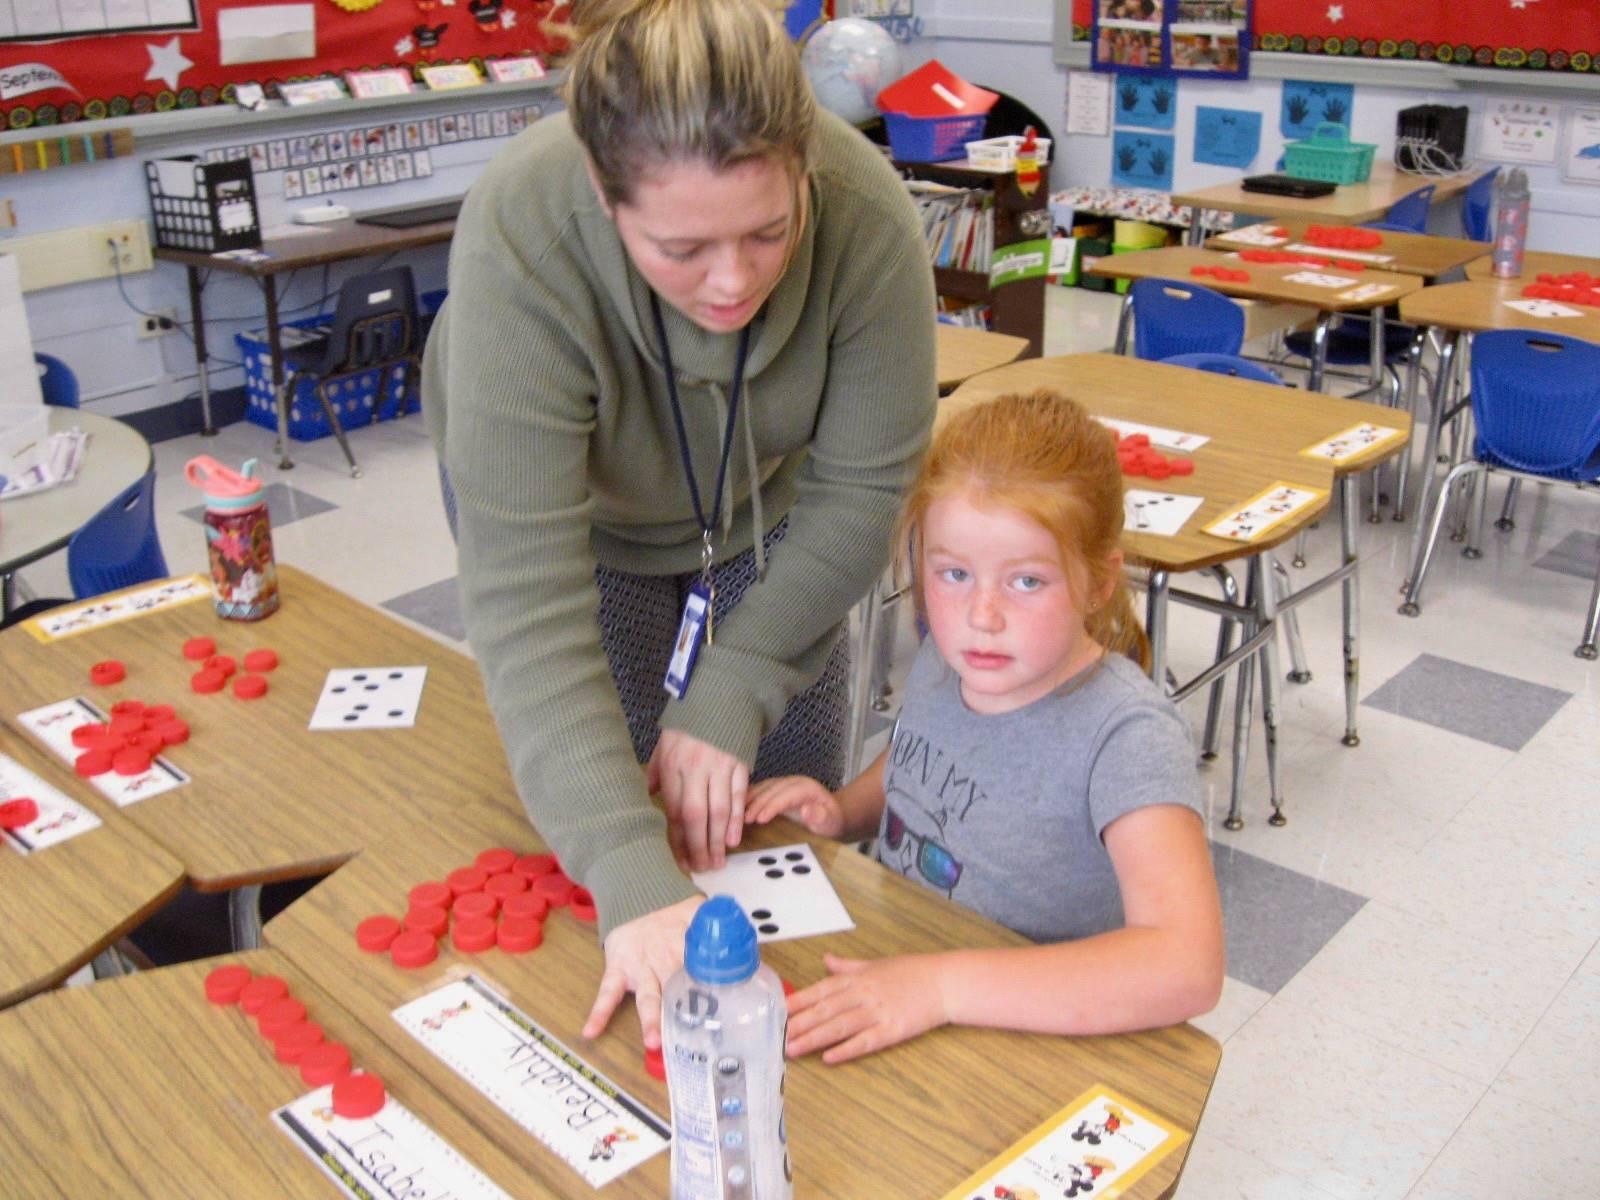 A student and teacher work on math.